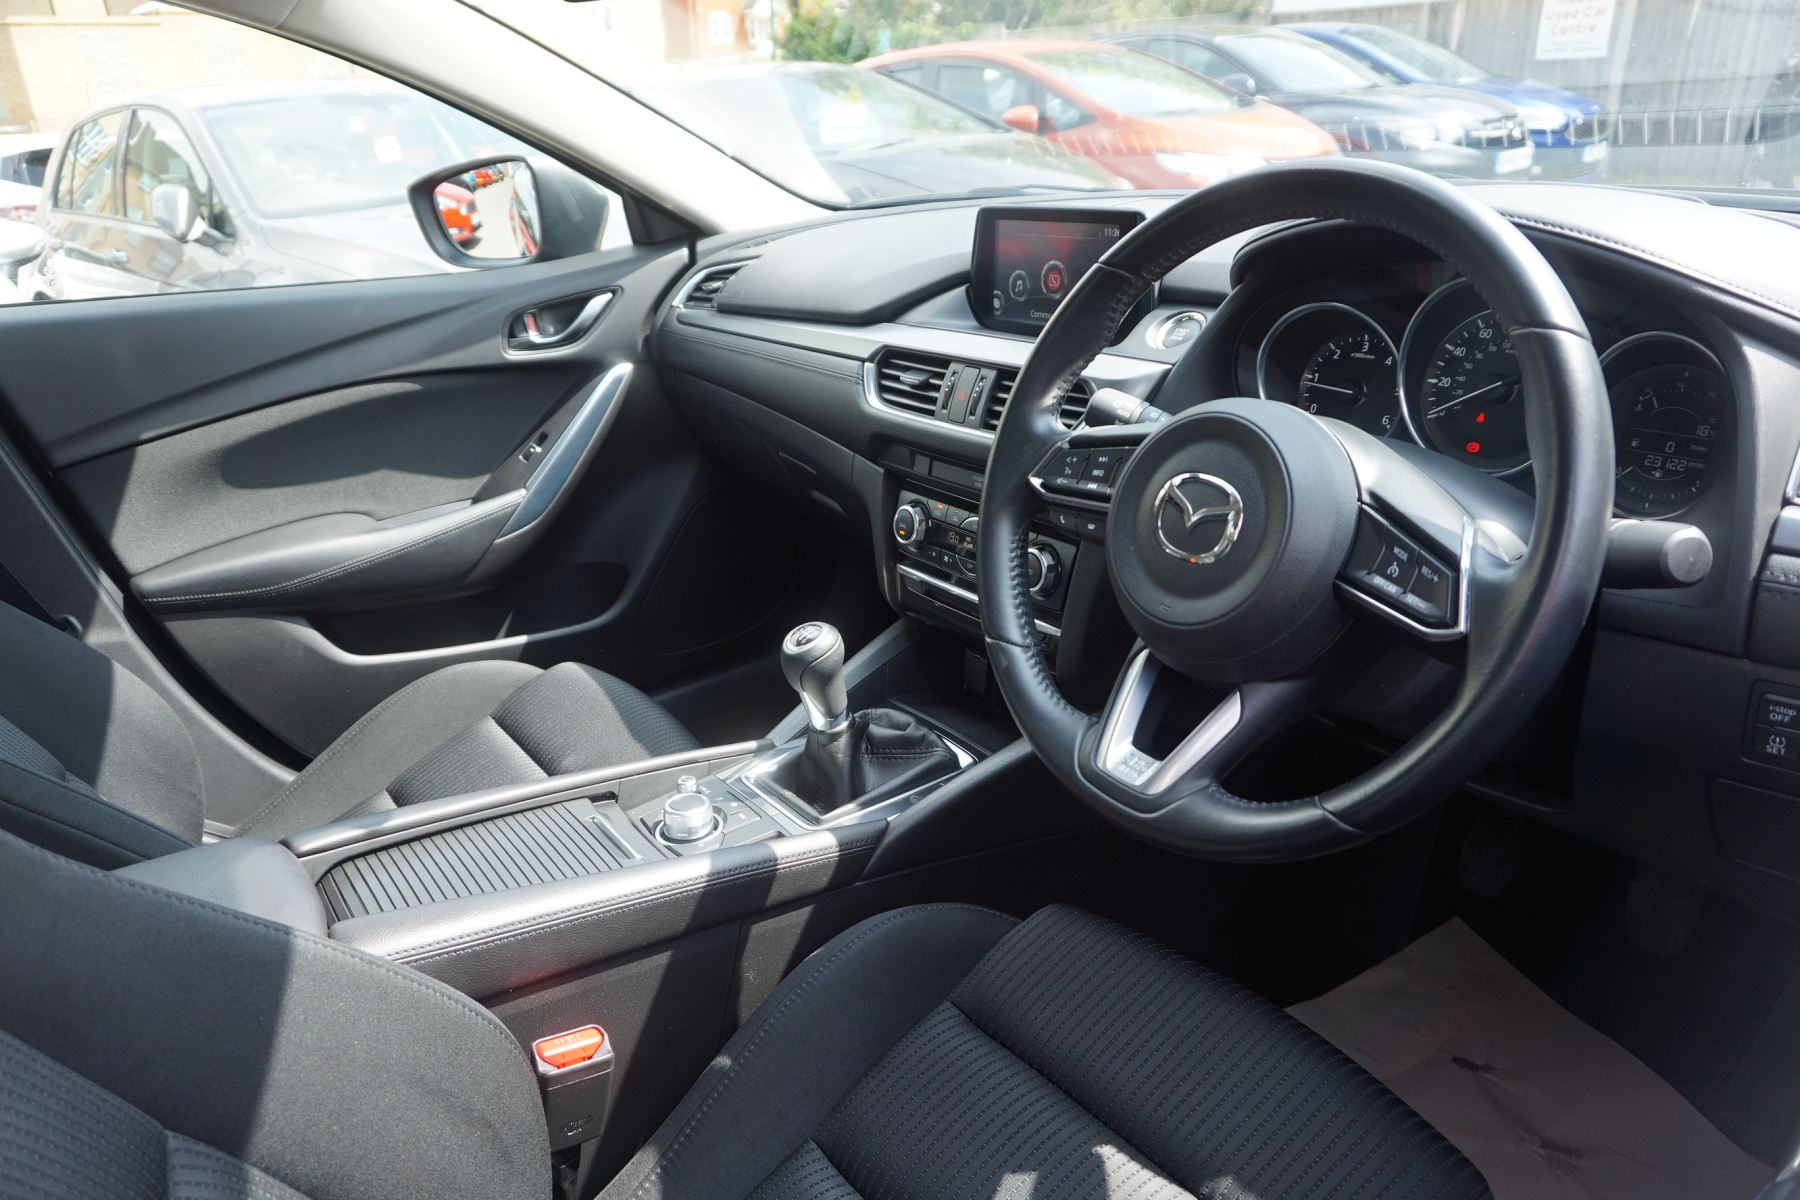 Mazda 6 2.2d SE-L Nav 4dr image 19